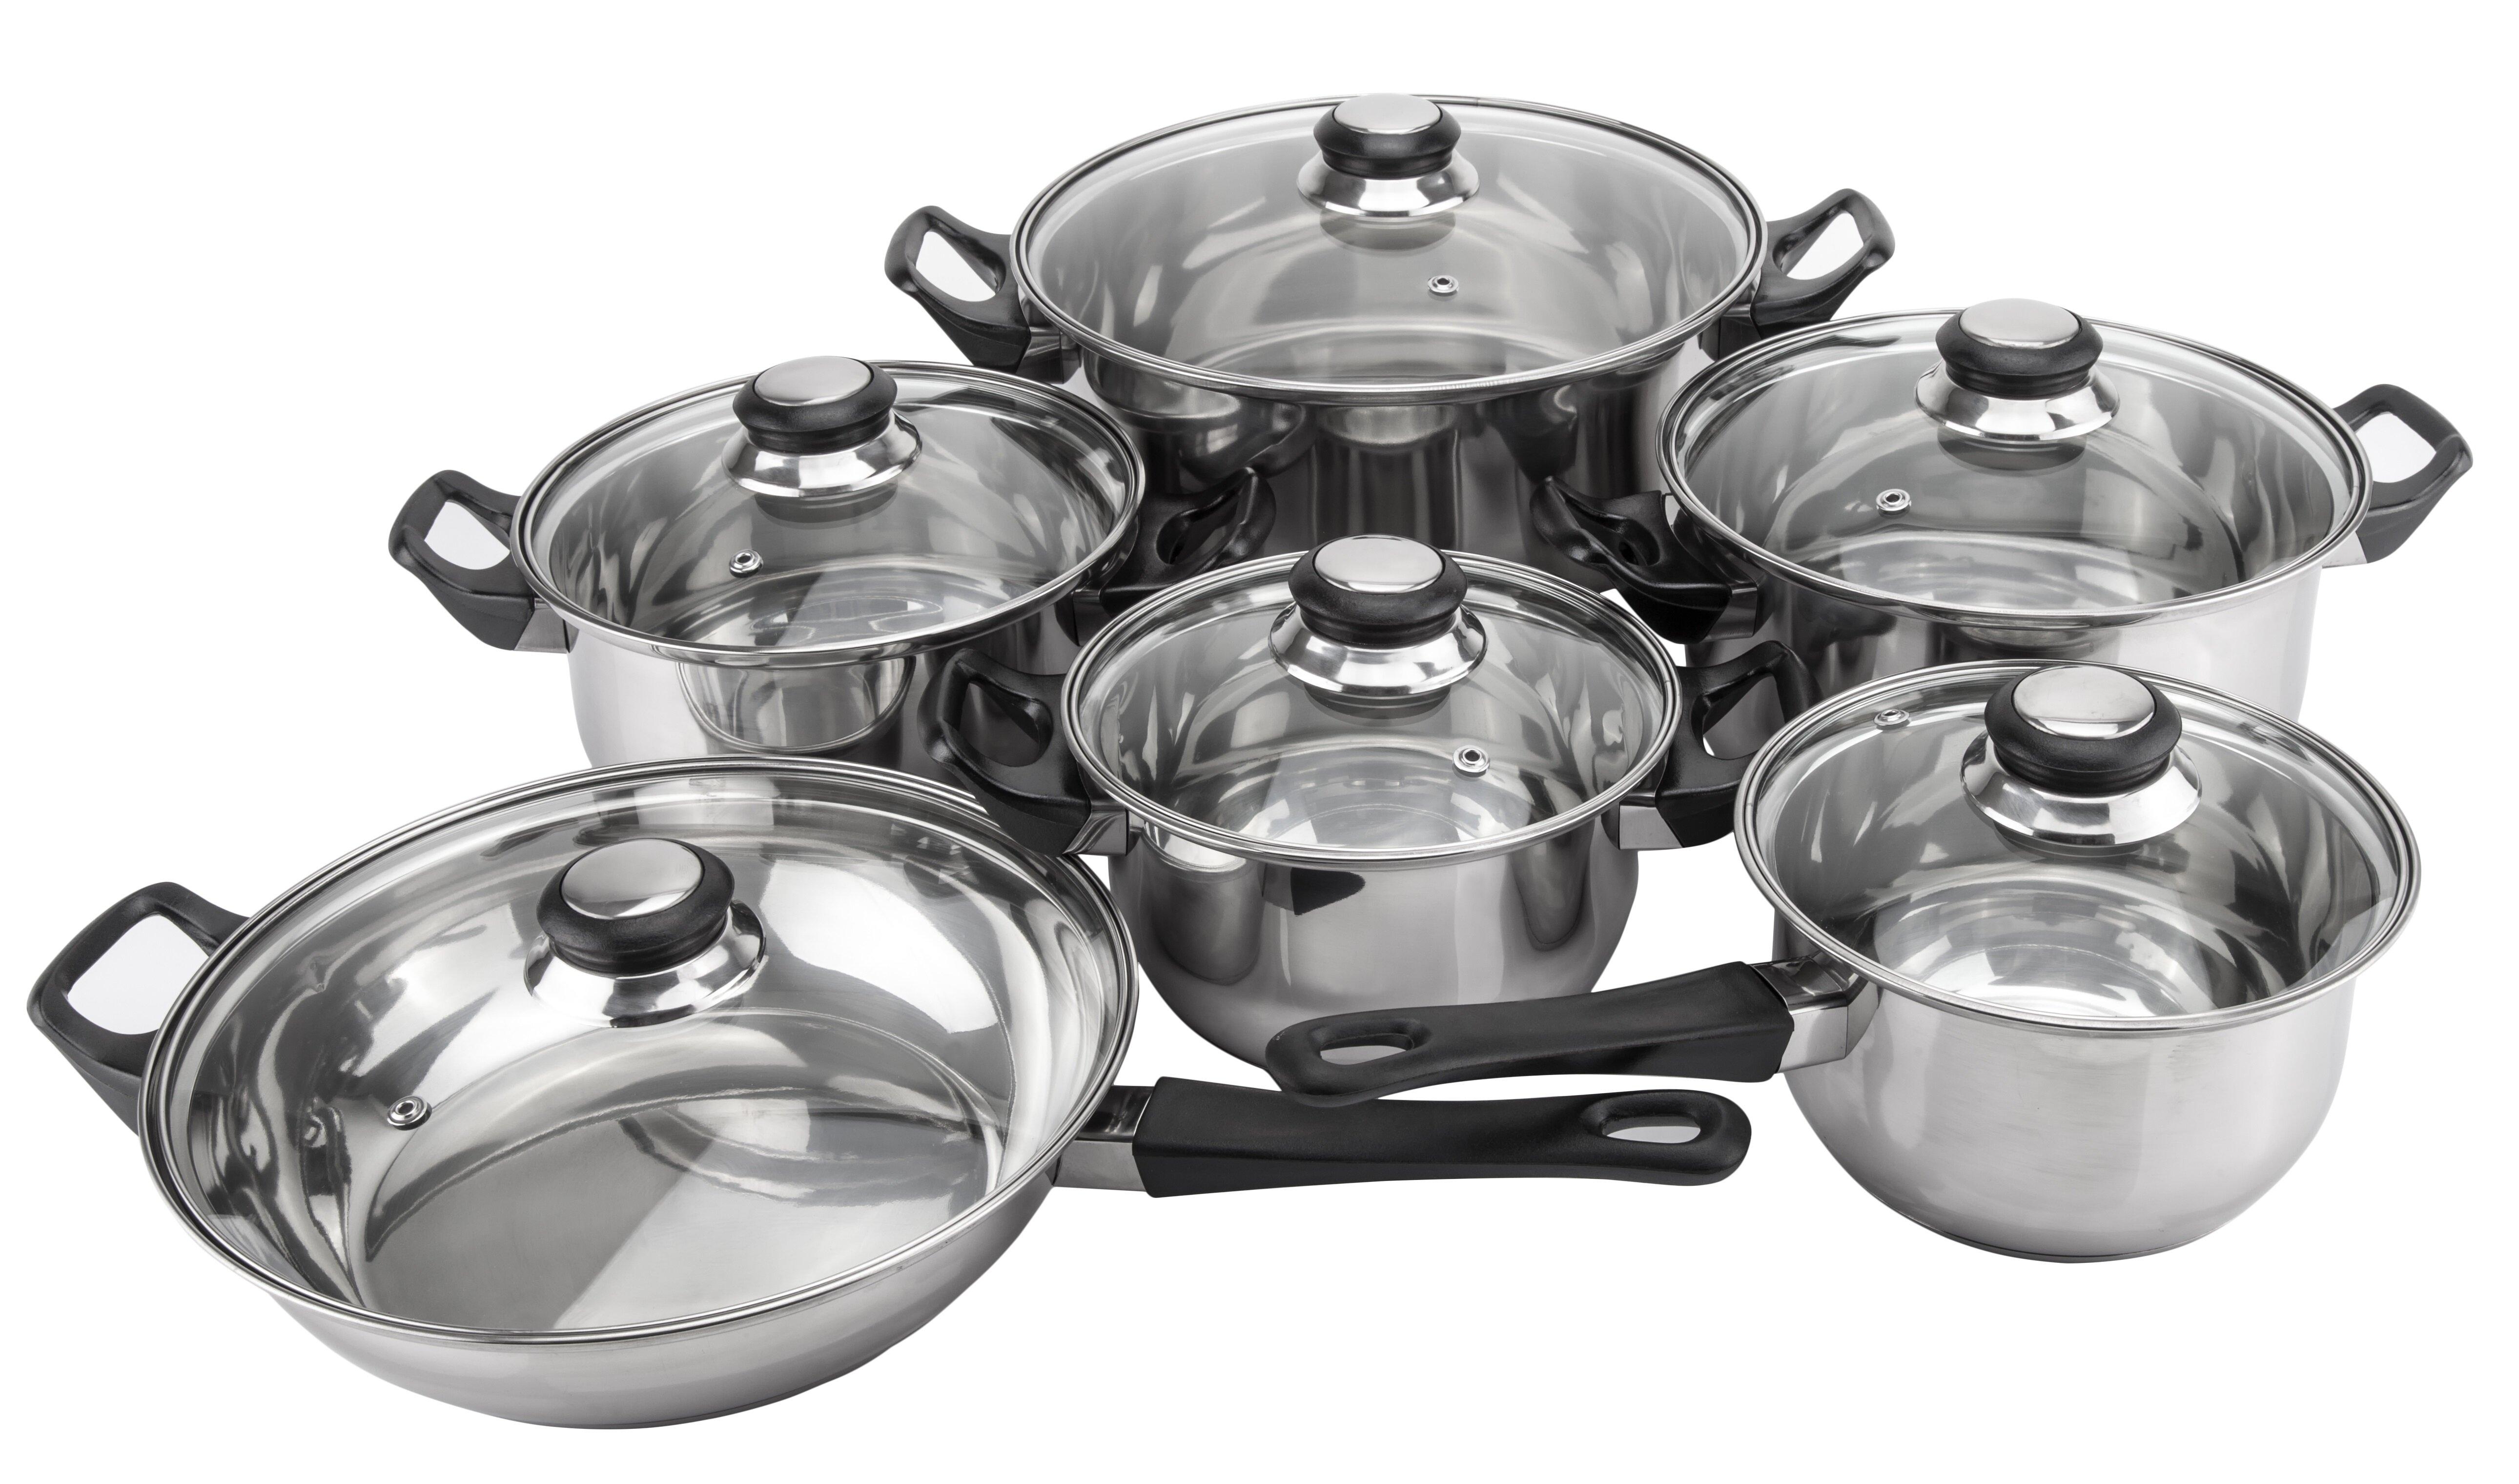 Monterrey 12 Piece Non Stick Priminute Stainless Steel Cookware Set